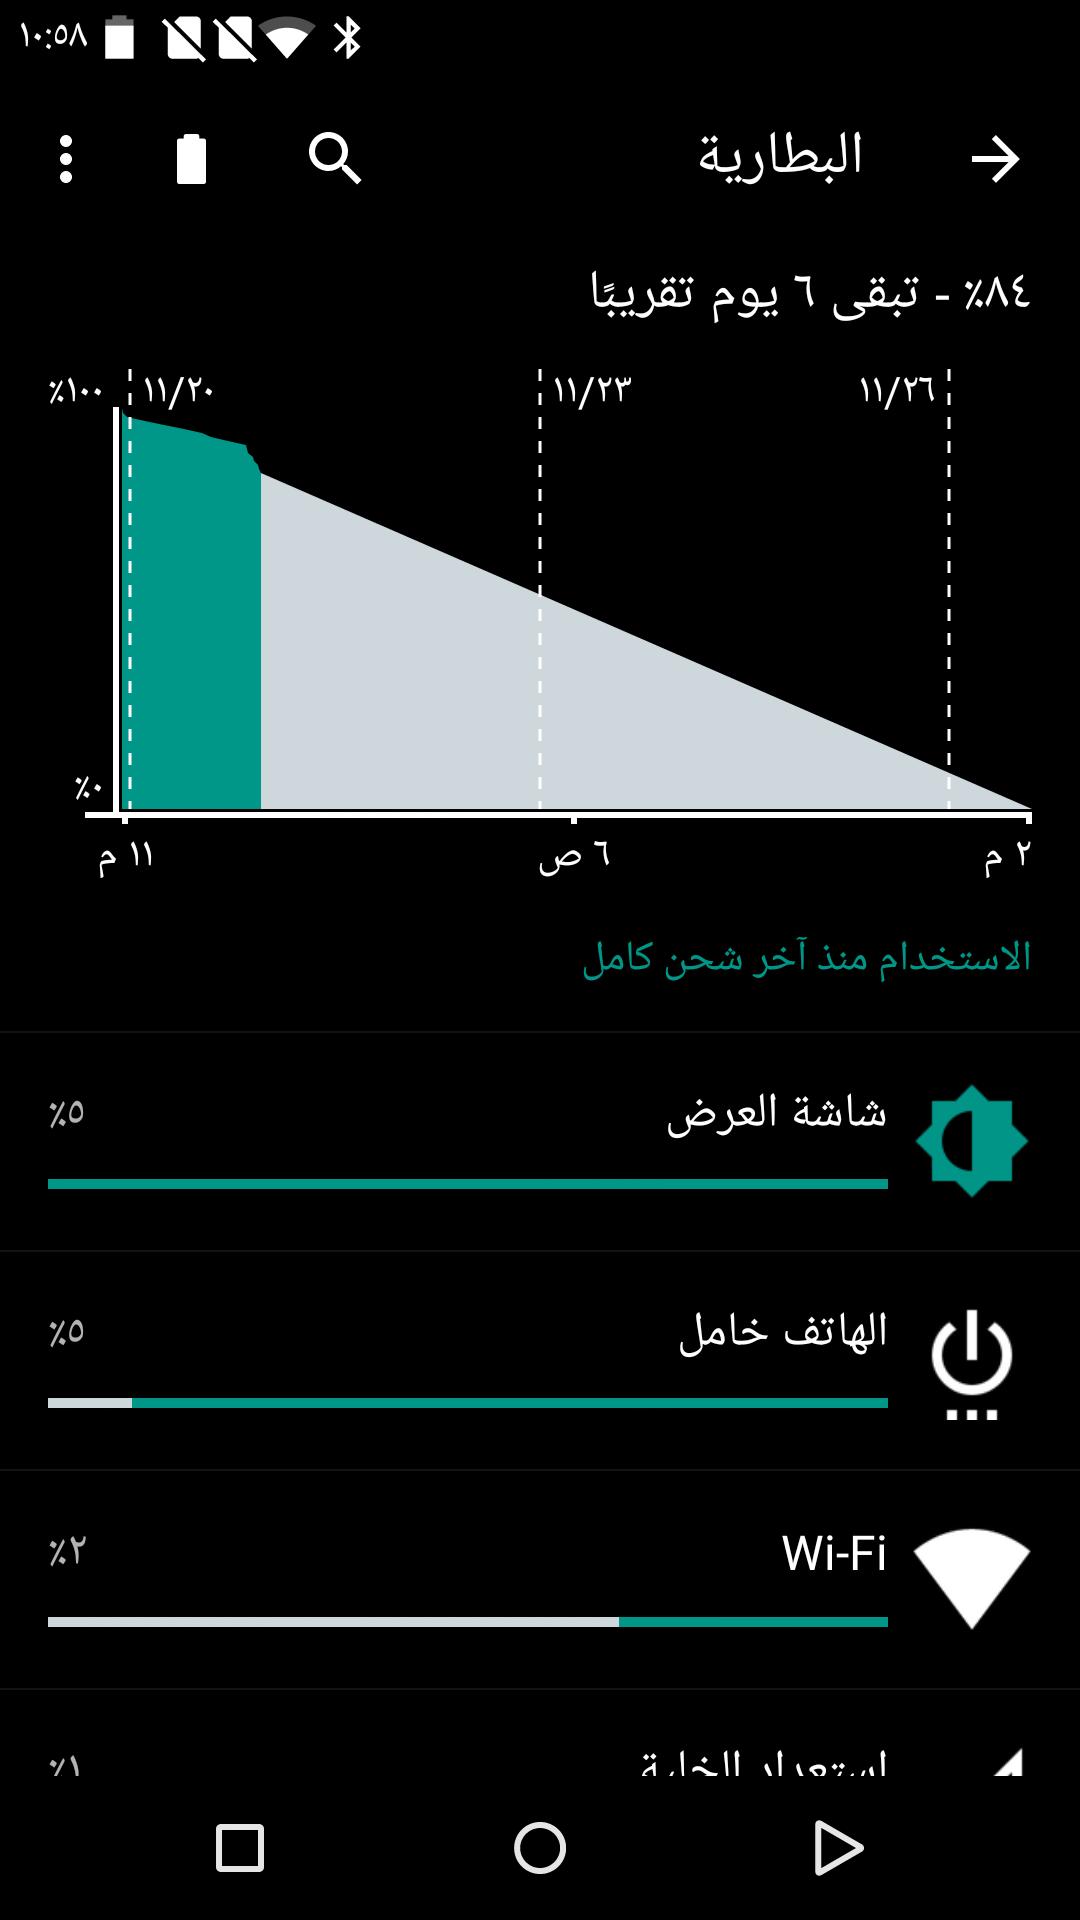 Screenshot_٢٠١٥-١١-٢٠-٢٢-٥٨-٢٨